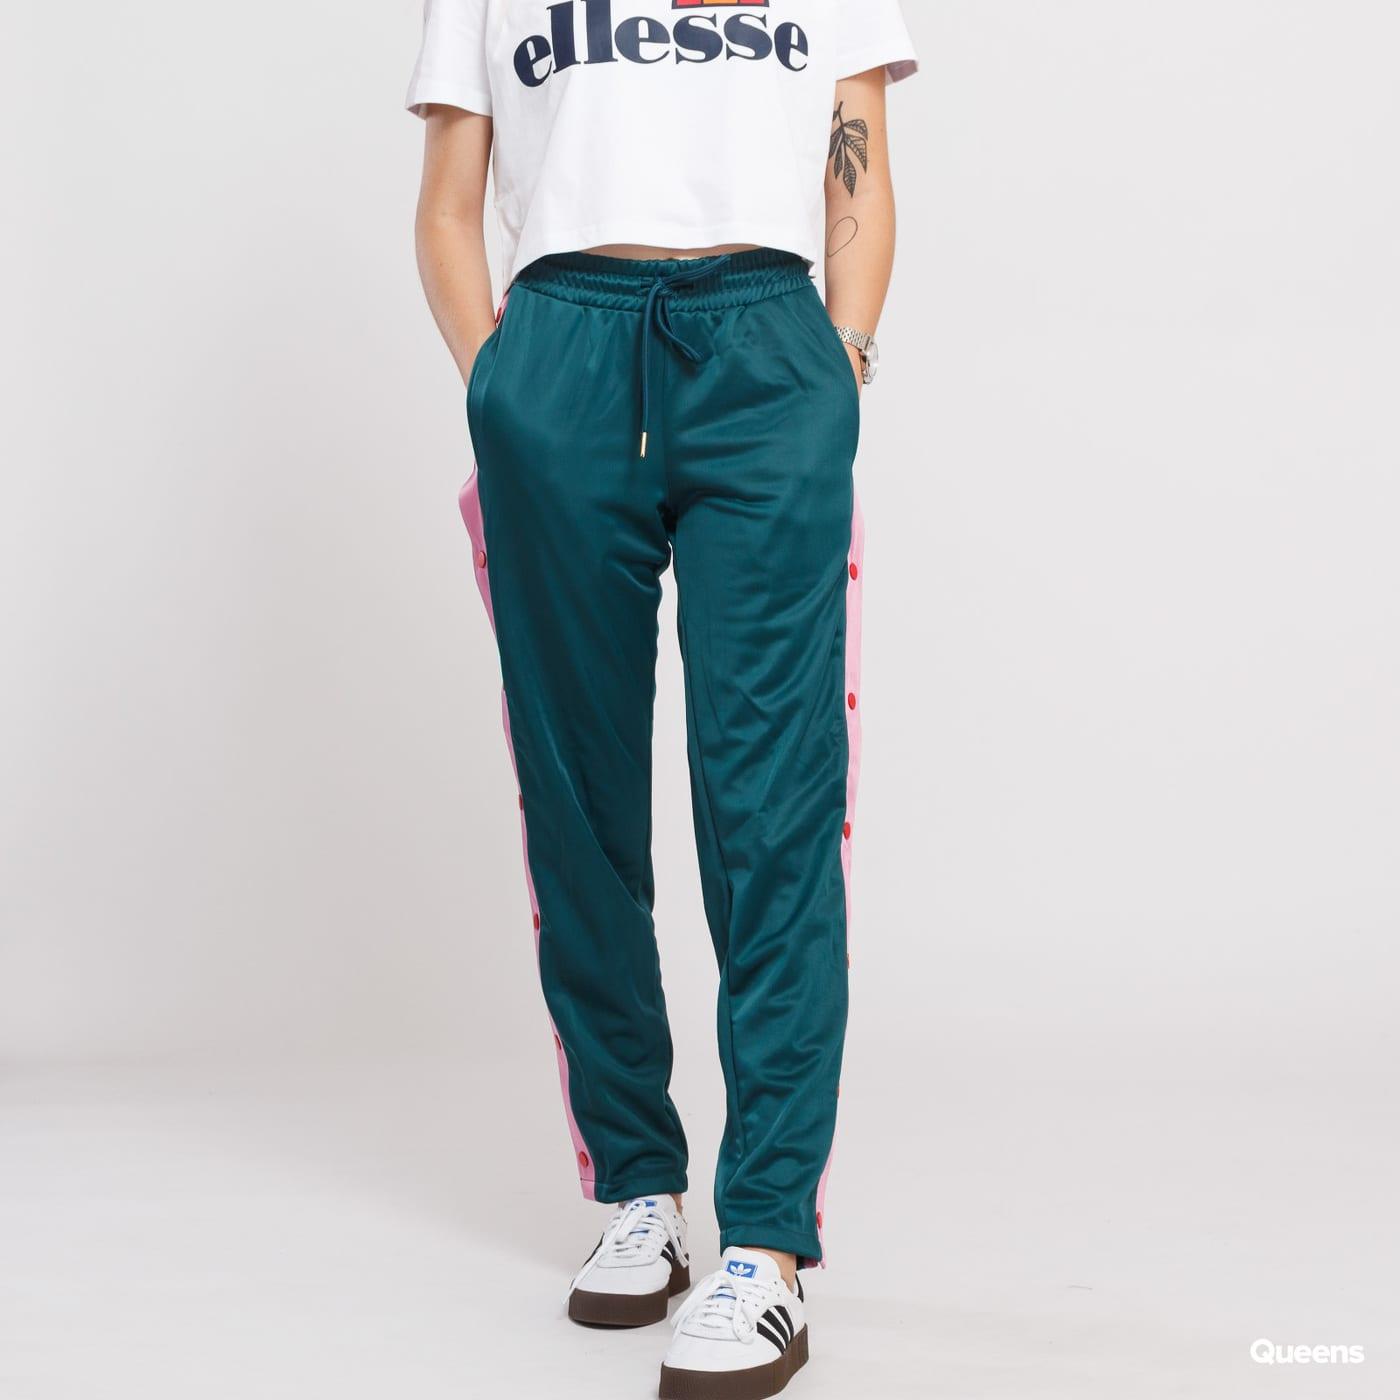 Urban Classics Ladies Button Up Track Pants dunkelgrün / pink